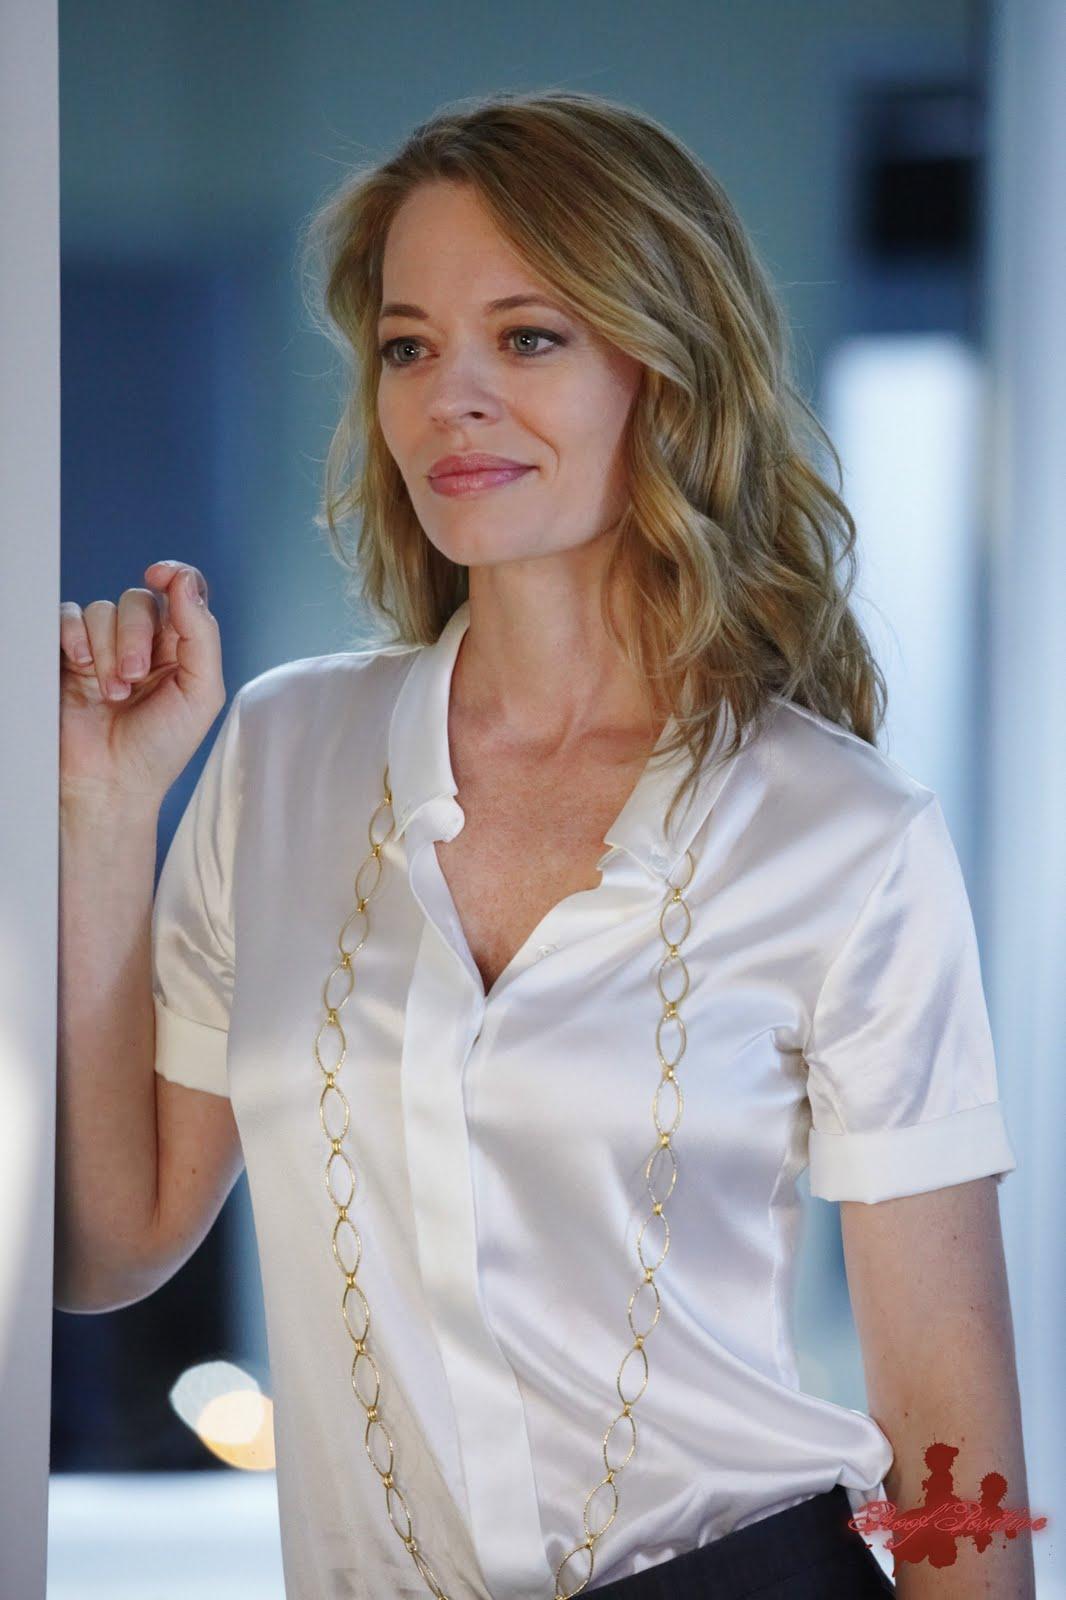 Ladies in Satin Blouses: kris jenner - white blouse